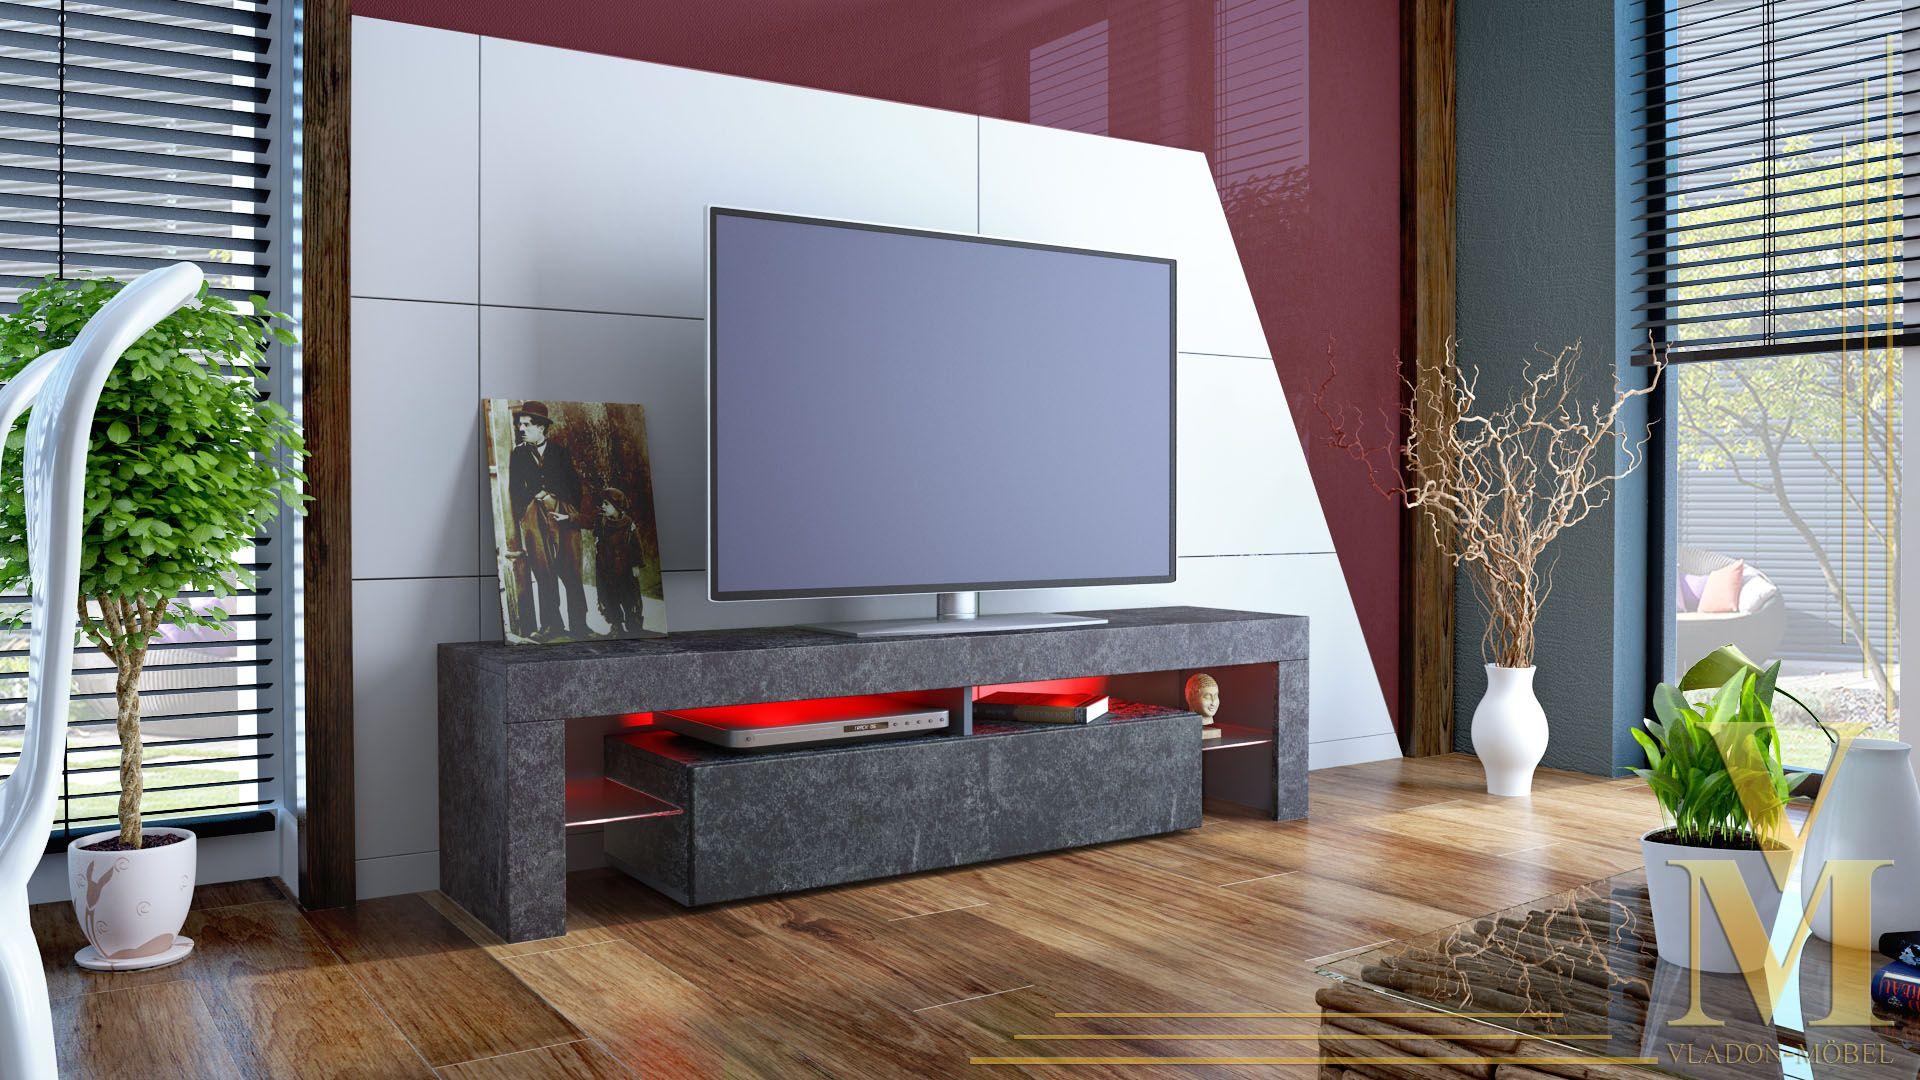 details zu tv lowboard board fernseher schrank tisch m bel rack regal lima schieferoptik lulu. Black Bedroom Furniture Sets. Home Design Ideas